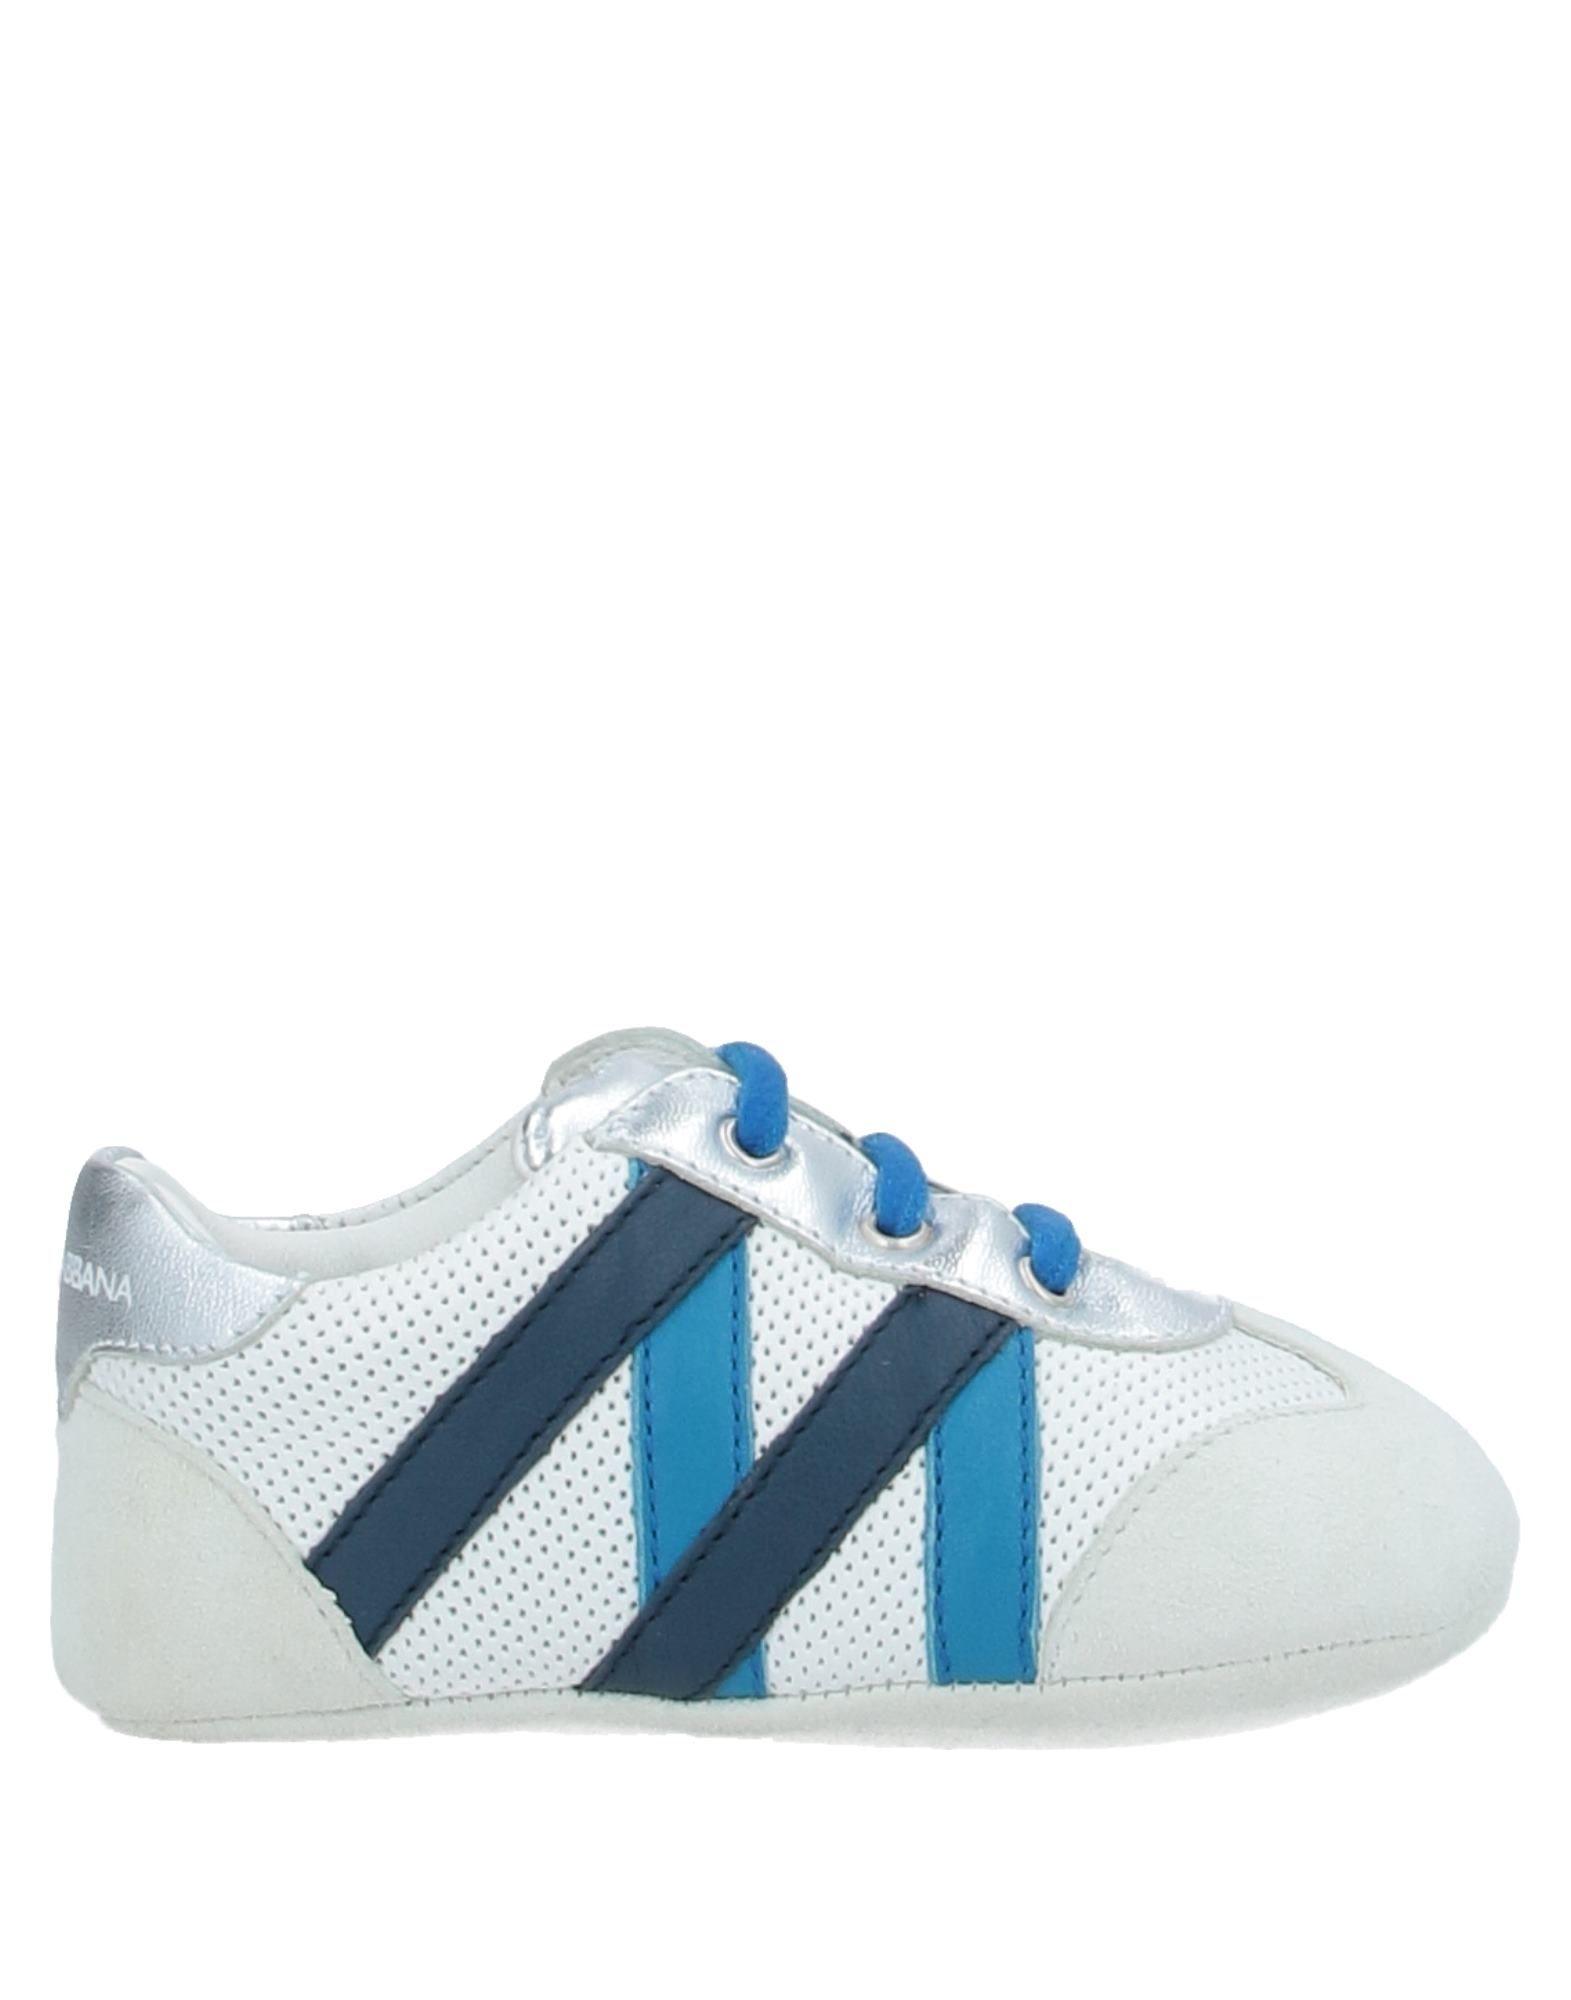 31e931dad8 Παπούτσια Αγόρι Dolce   Gabbana 0-24 μηνών - Παιδικά ρούχα στο YOOX